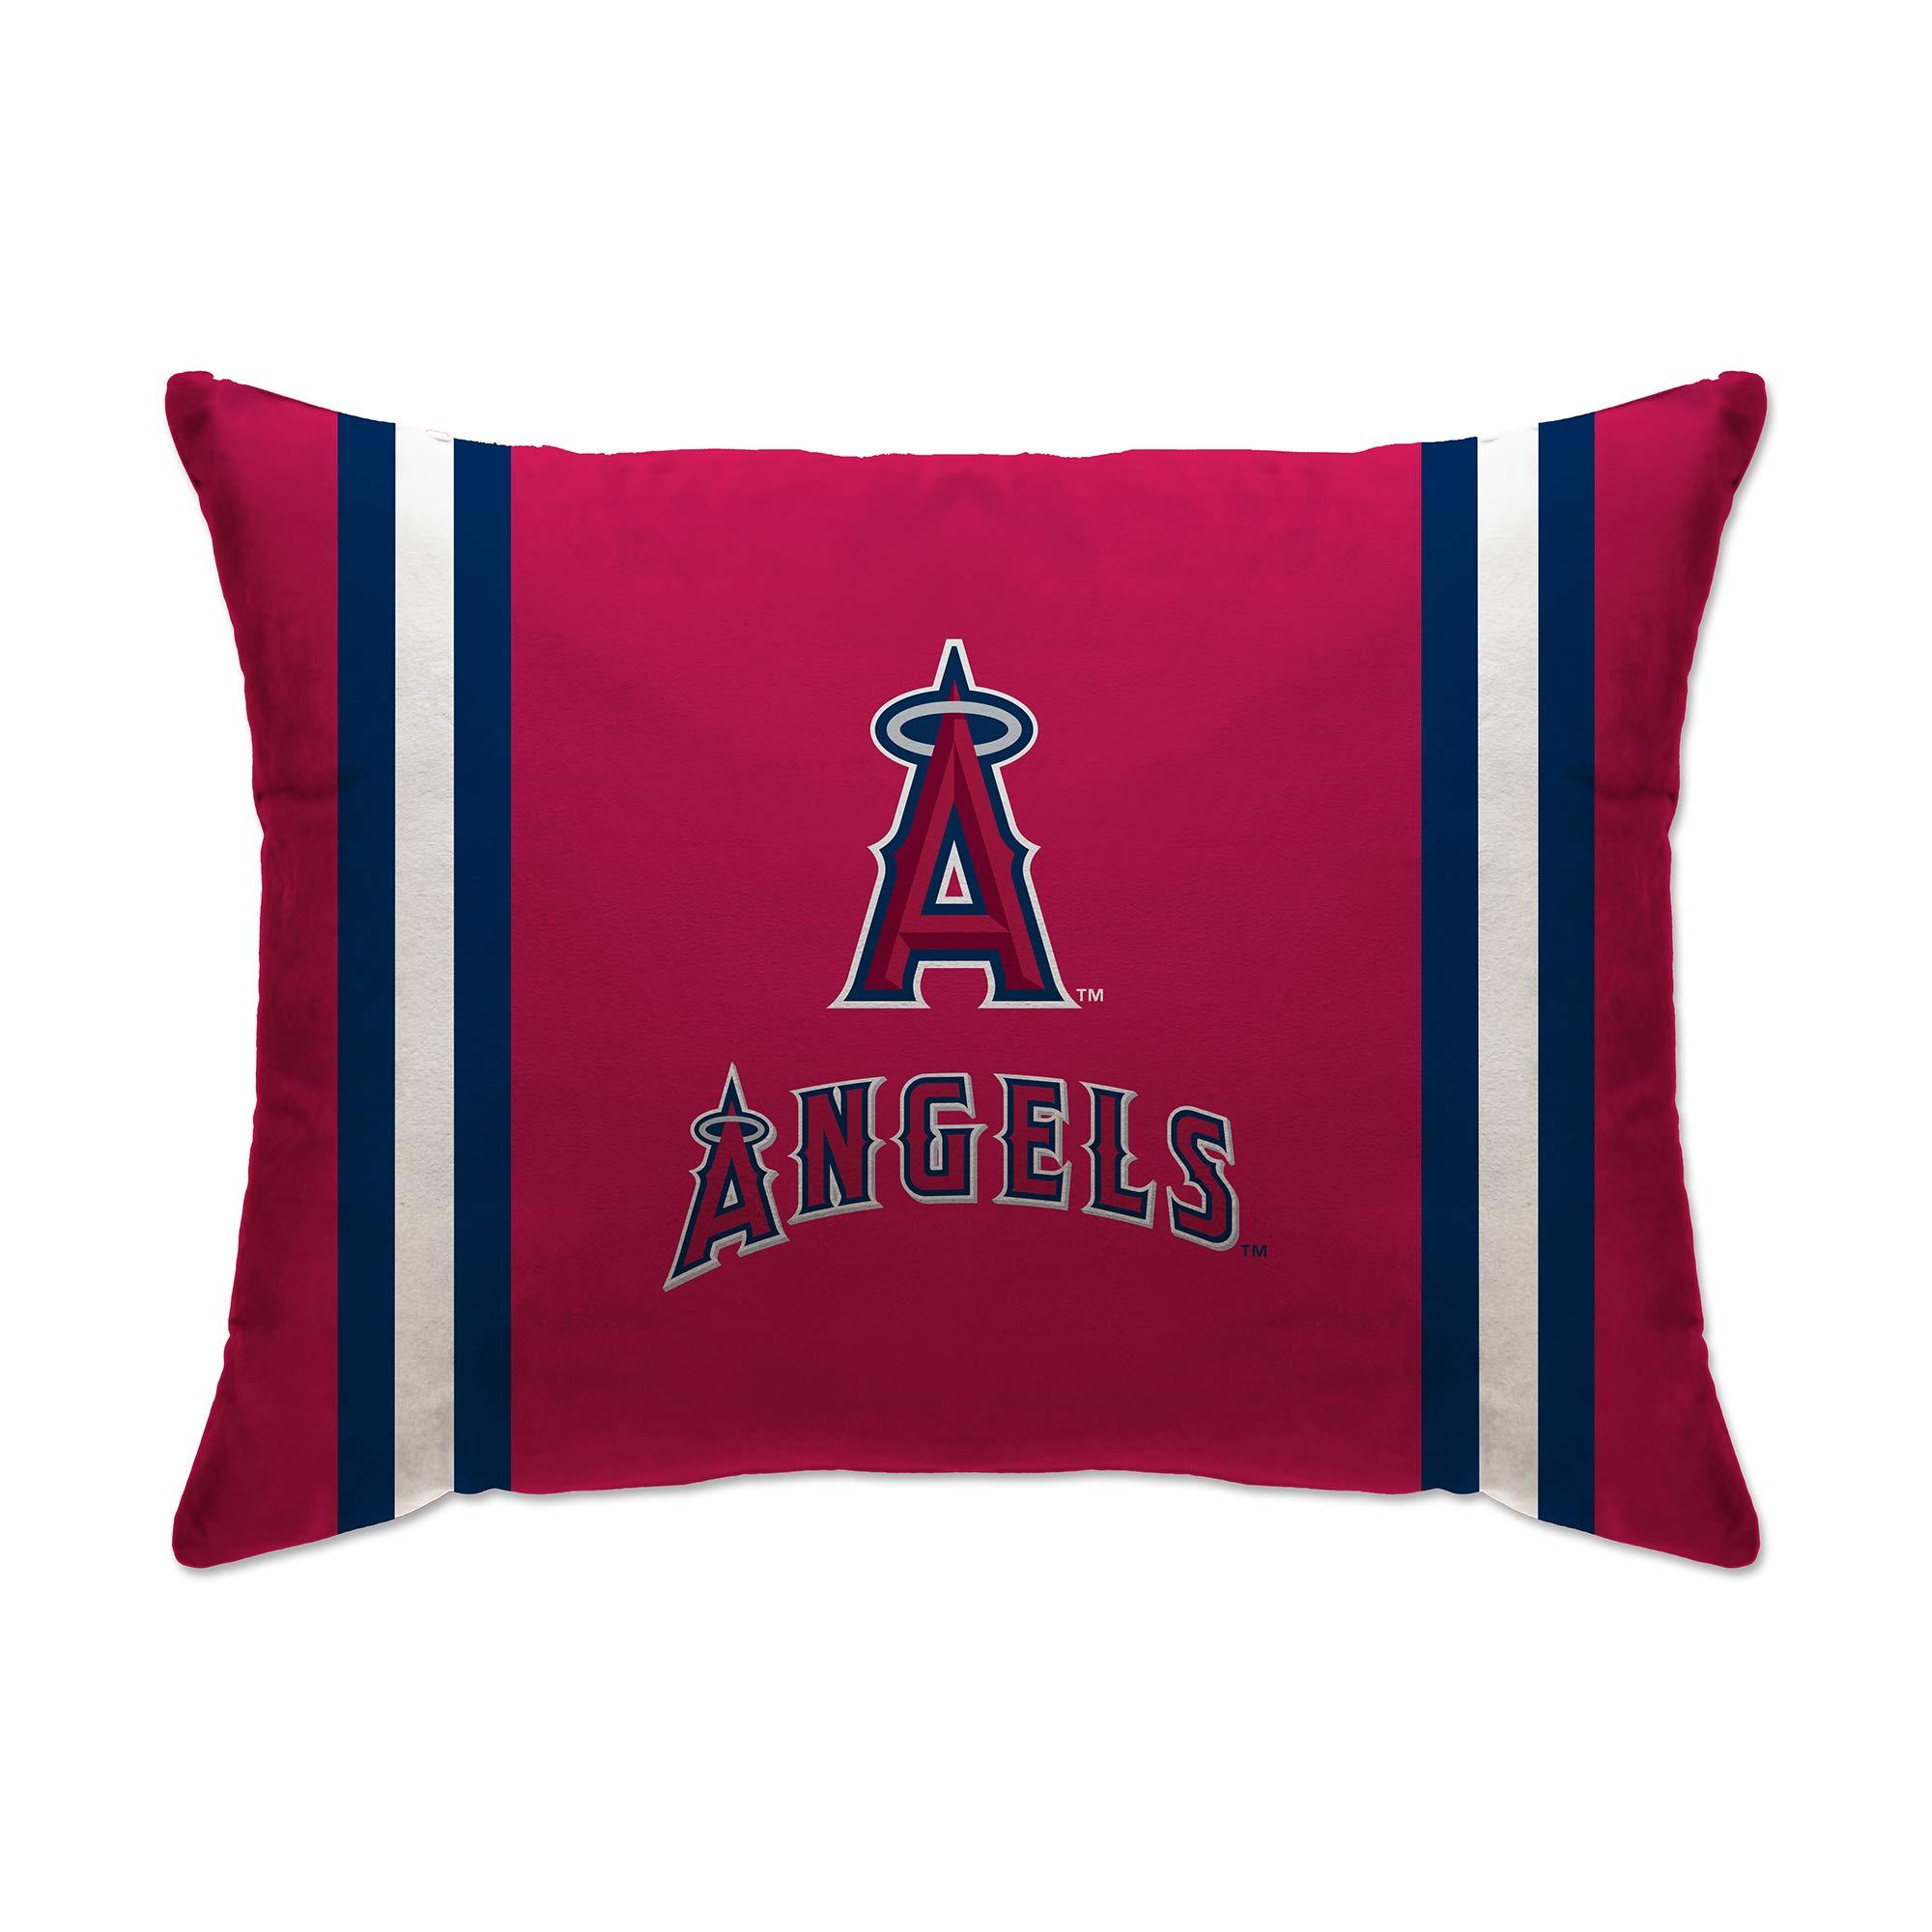 Pegasus Sports Los Angeles Angels 20'' x 26'' Plush Bed Pillow, Set of 2#654087706 by Pegasus Sports